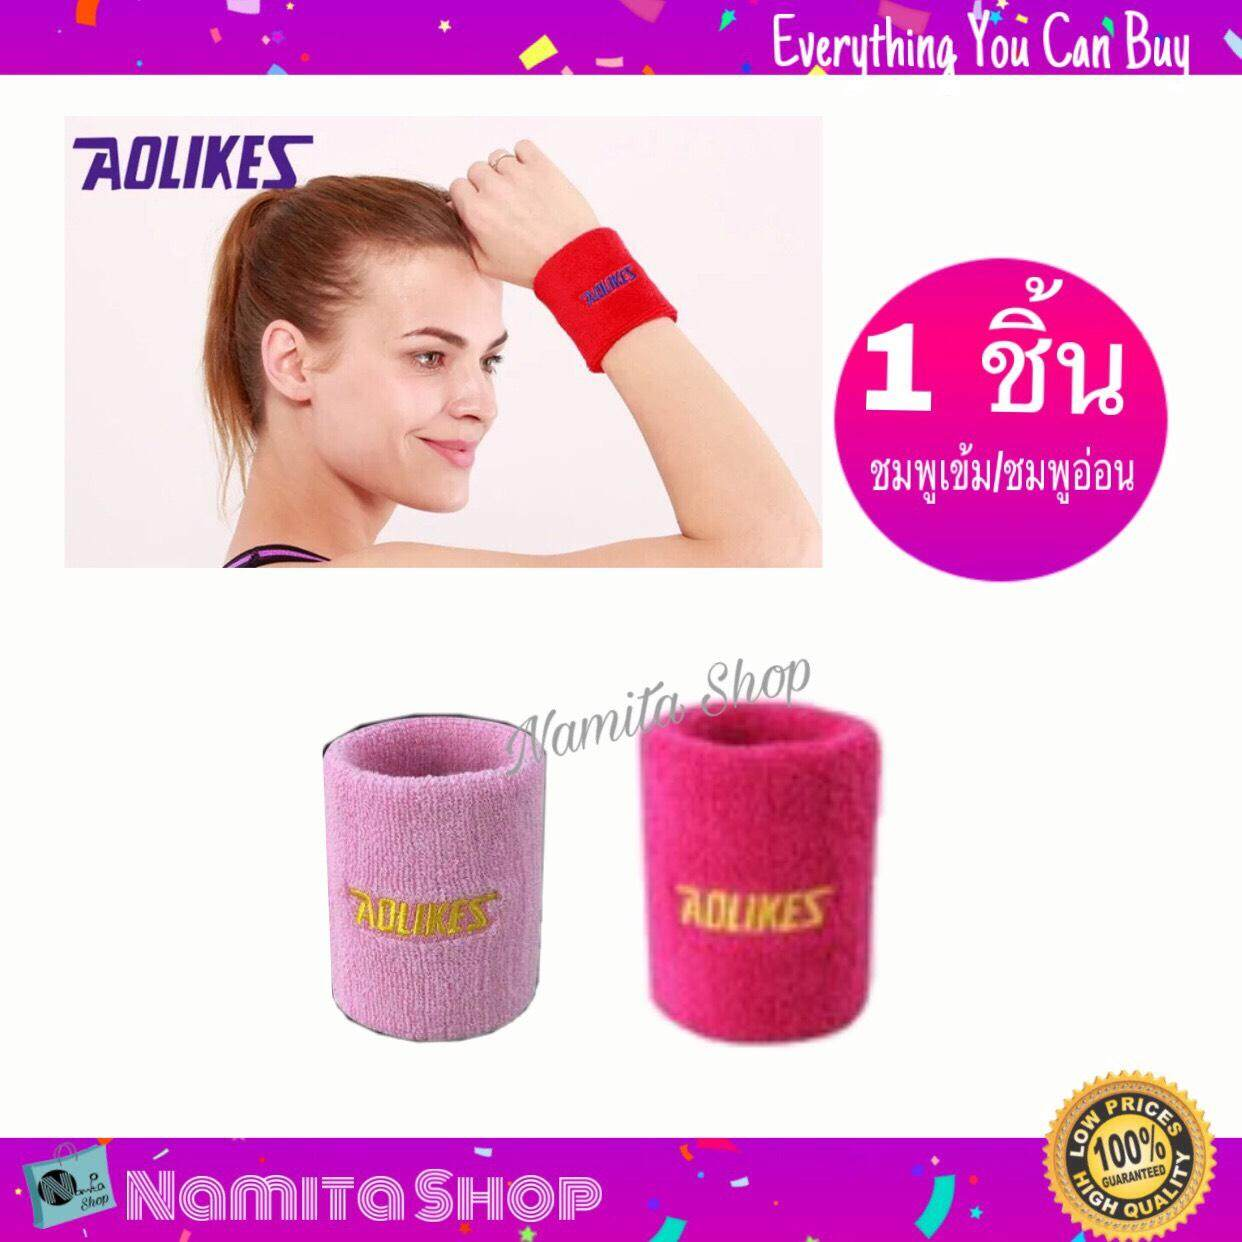 Namita Aolikes Wrist Support ผ้ารัดข้อมือ ปลอกข้อมือ ผ้าฝ้าย ซับเหงื่อ 1 ชิ้น By Namita Shop.